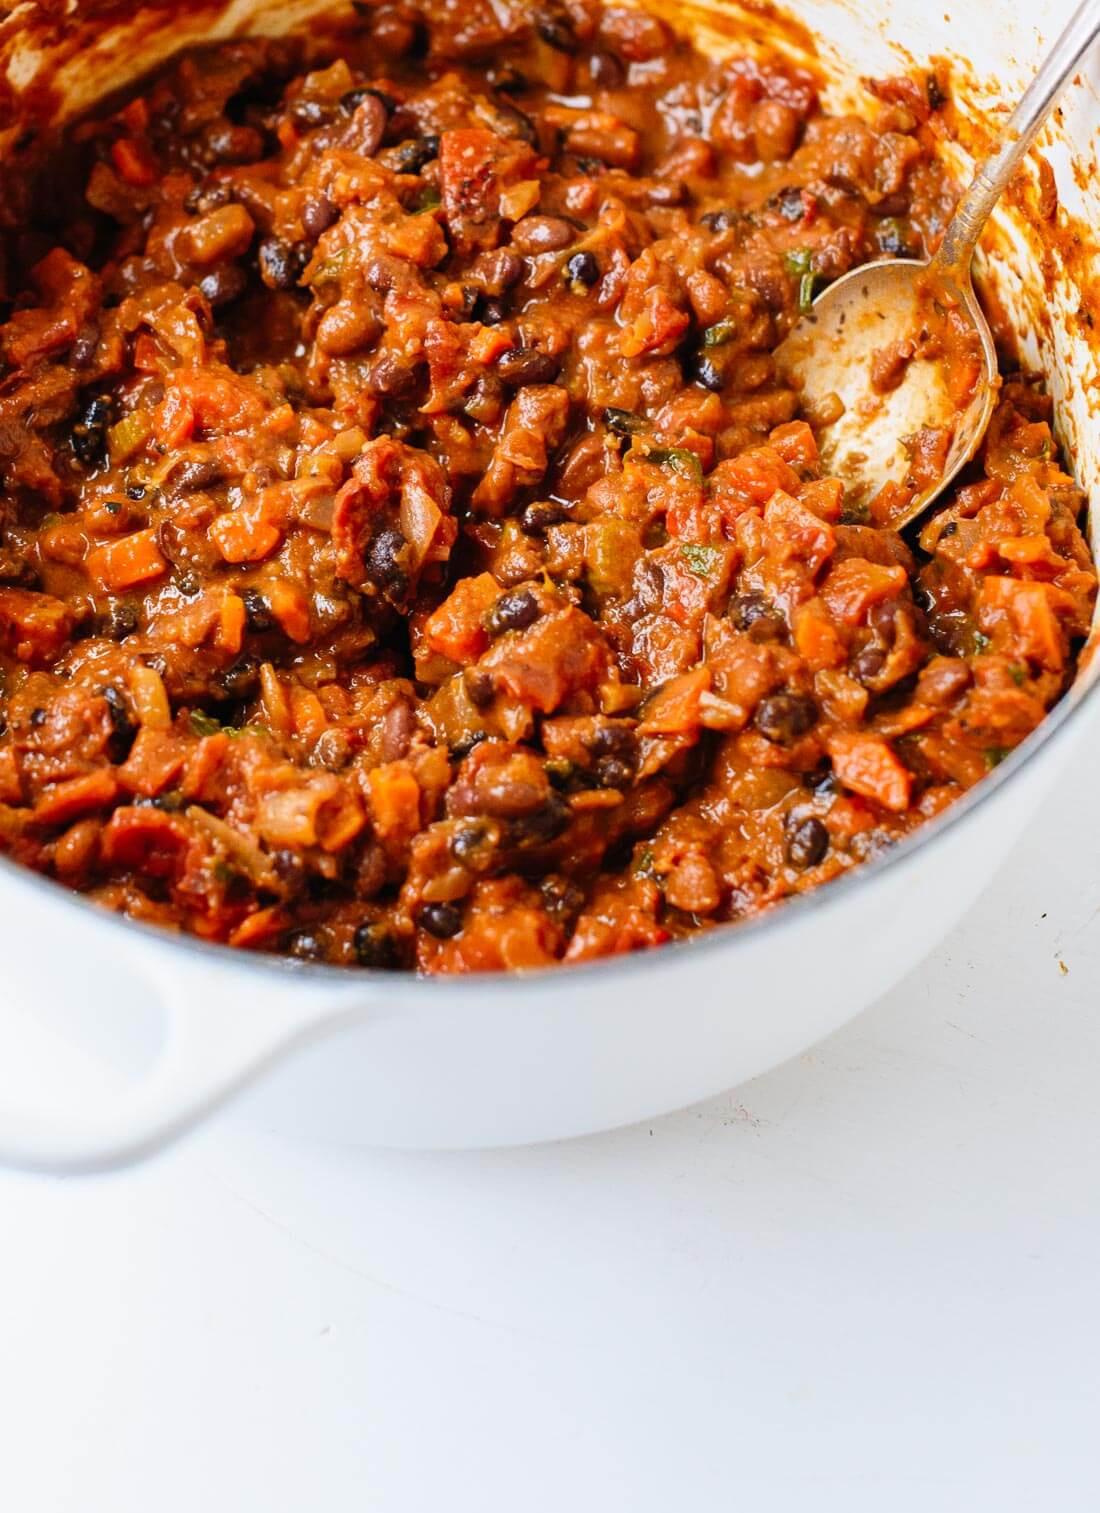 Vegetarian Chili Allrecipes  Homemade Ve arian Chili Cookie and Kate